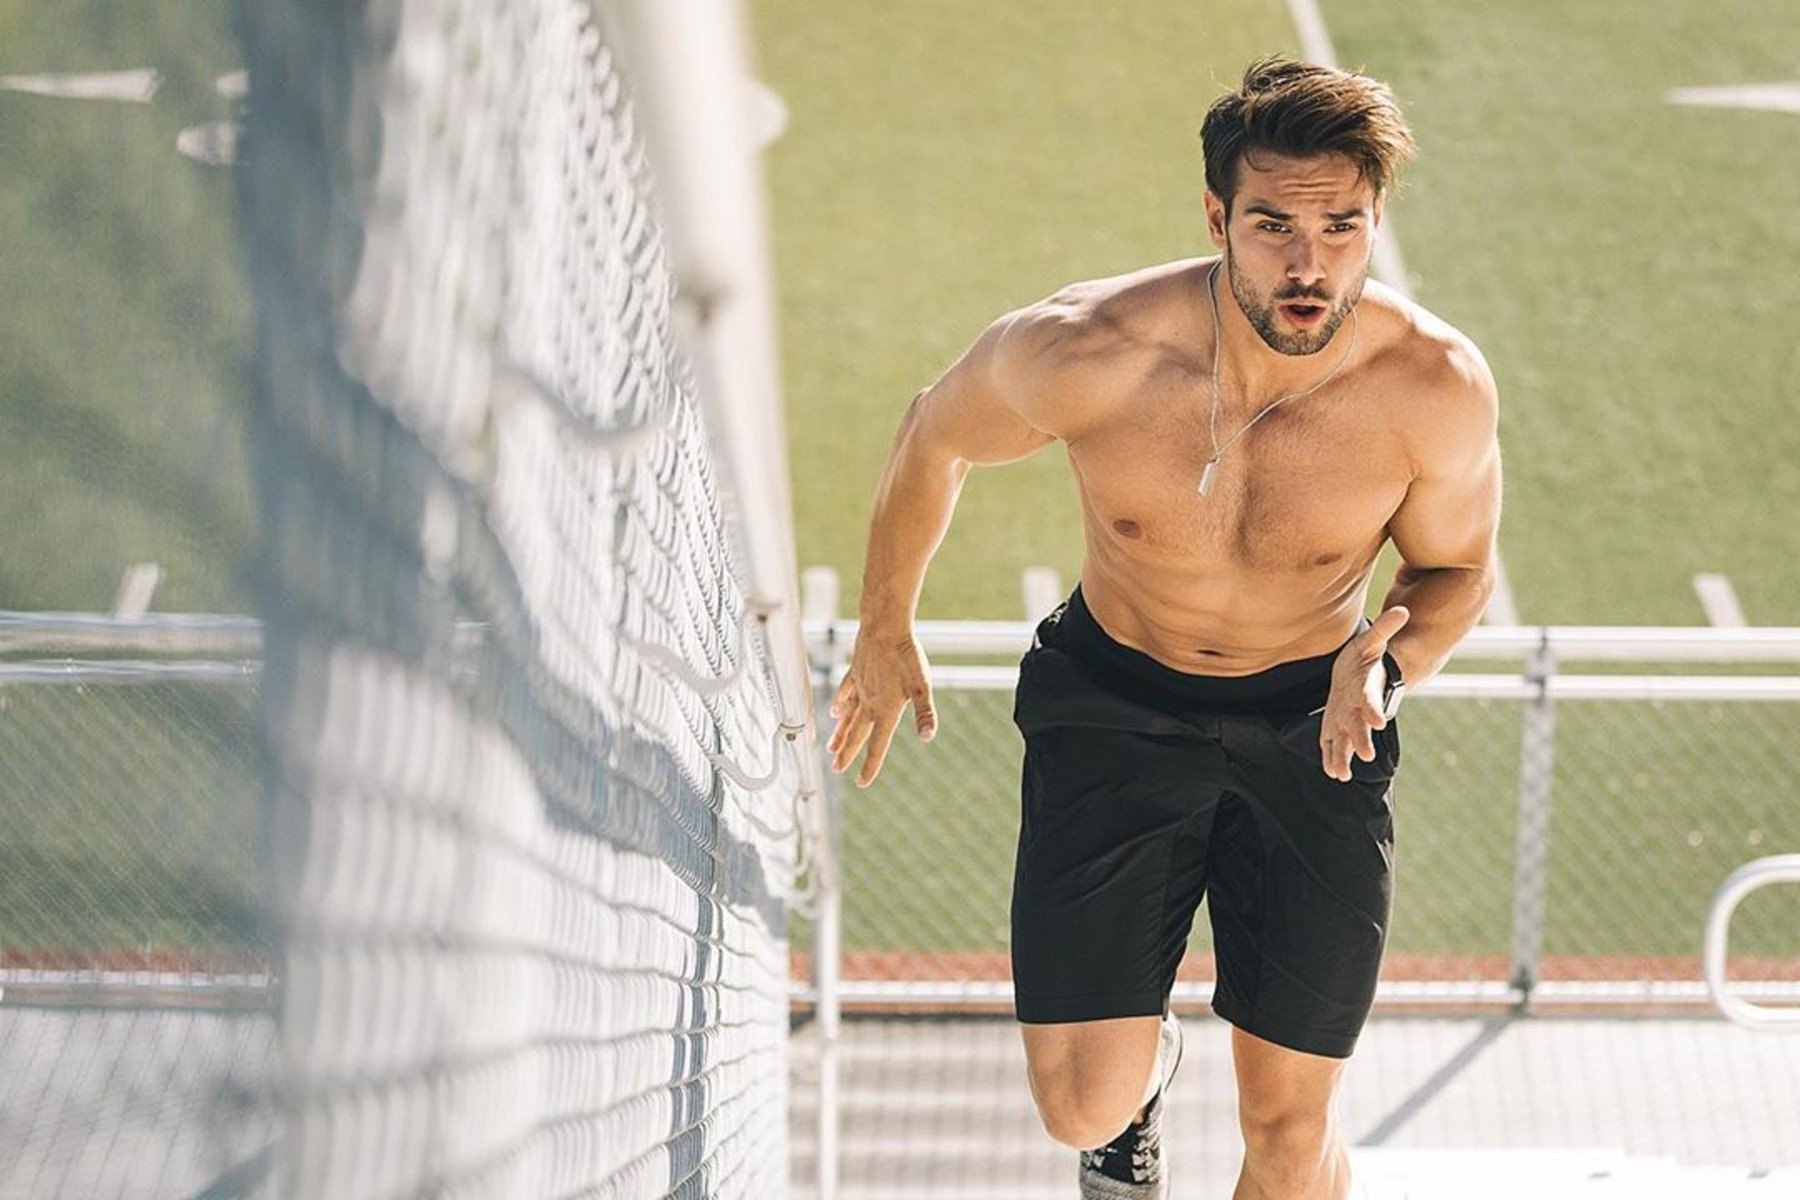 Routine abdos pour obtenir le 6 pack – Jordan Morello